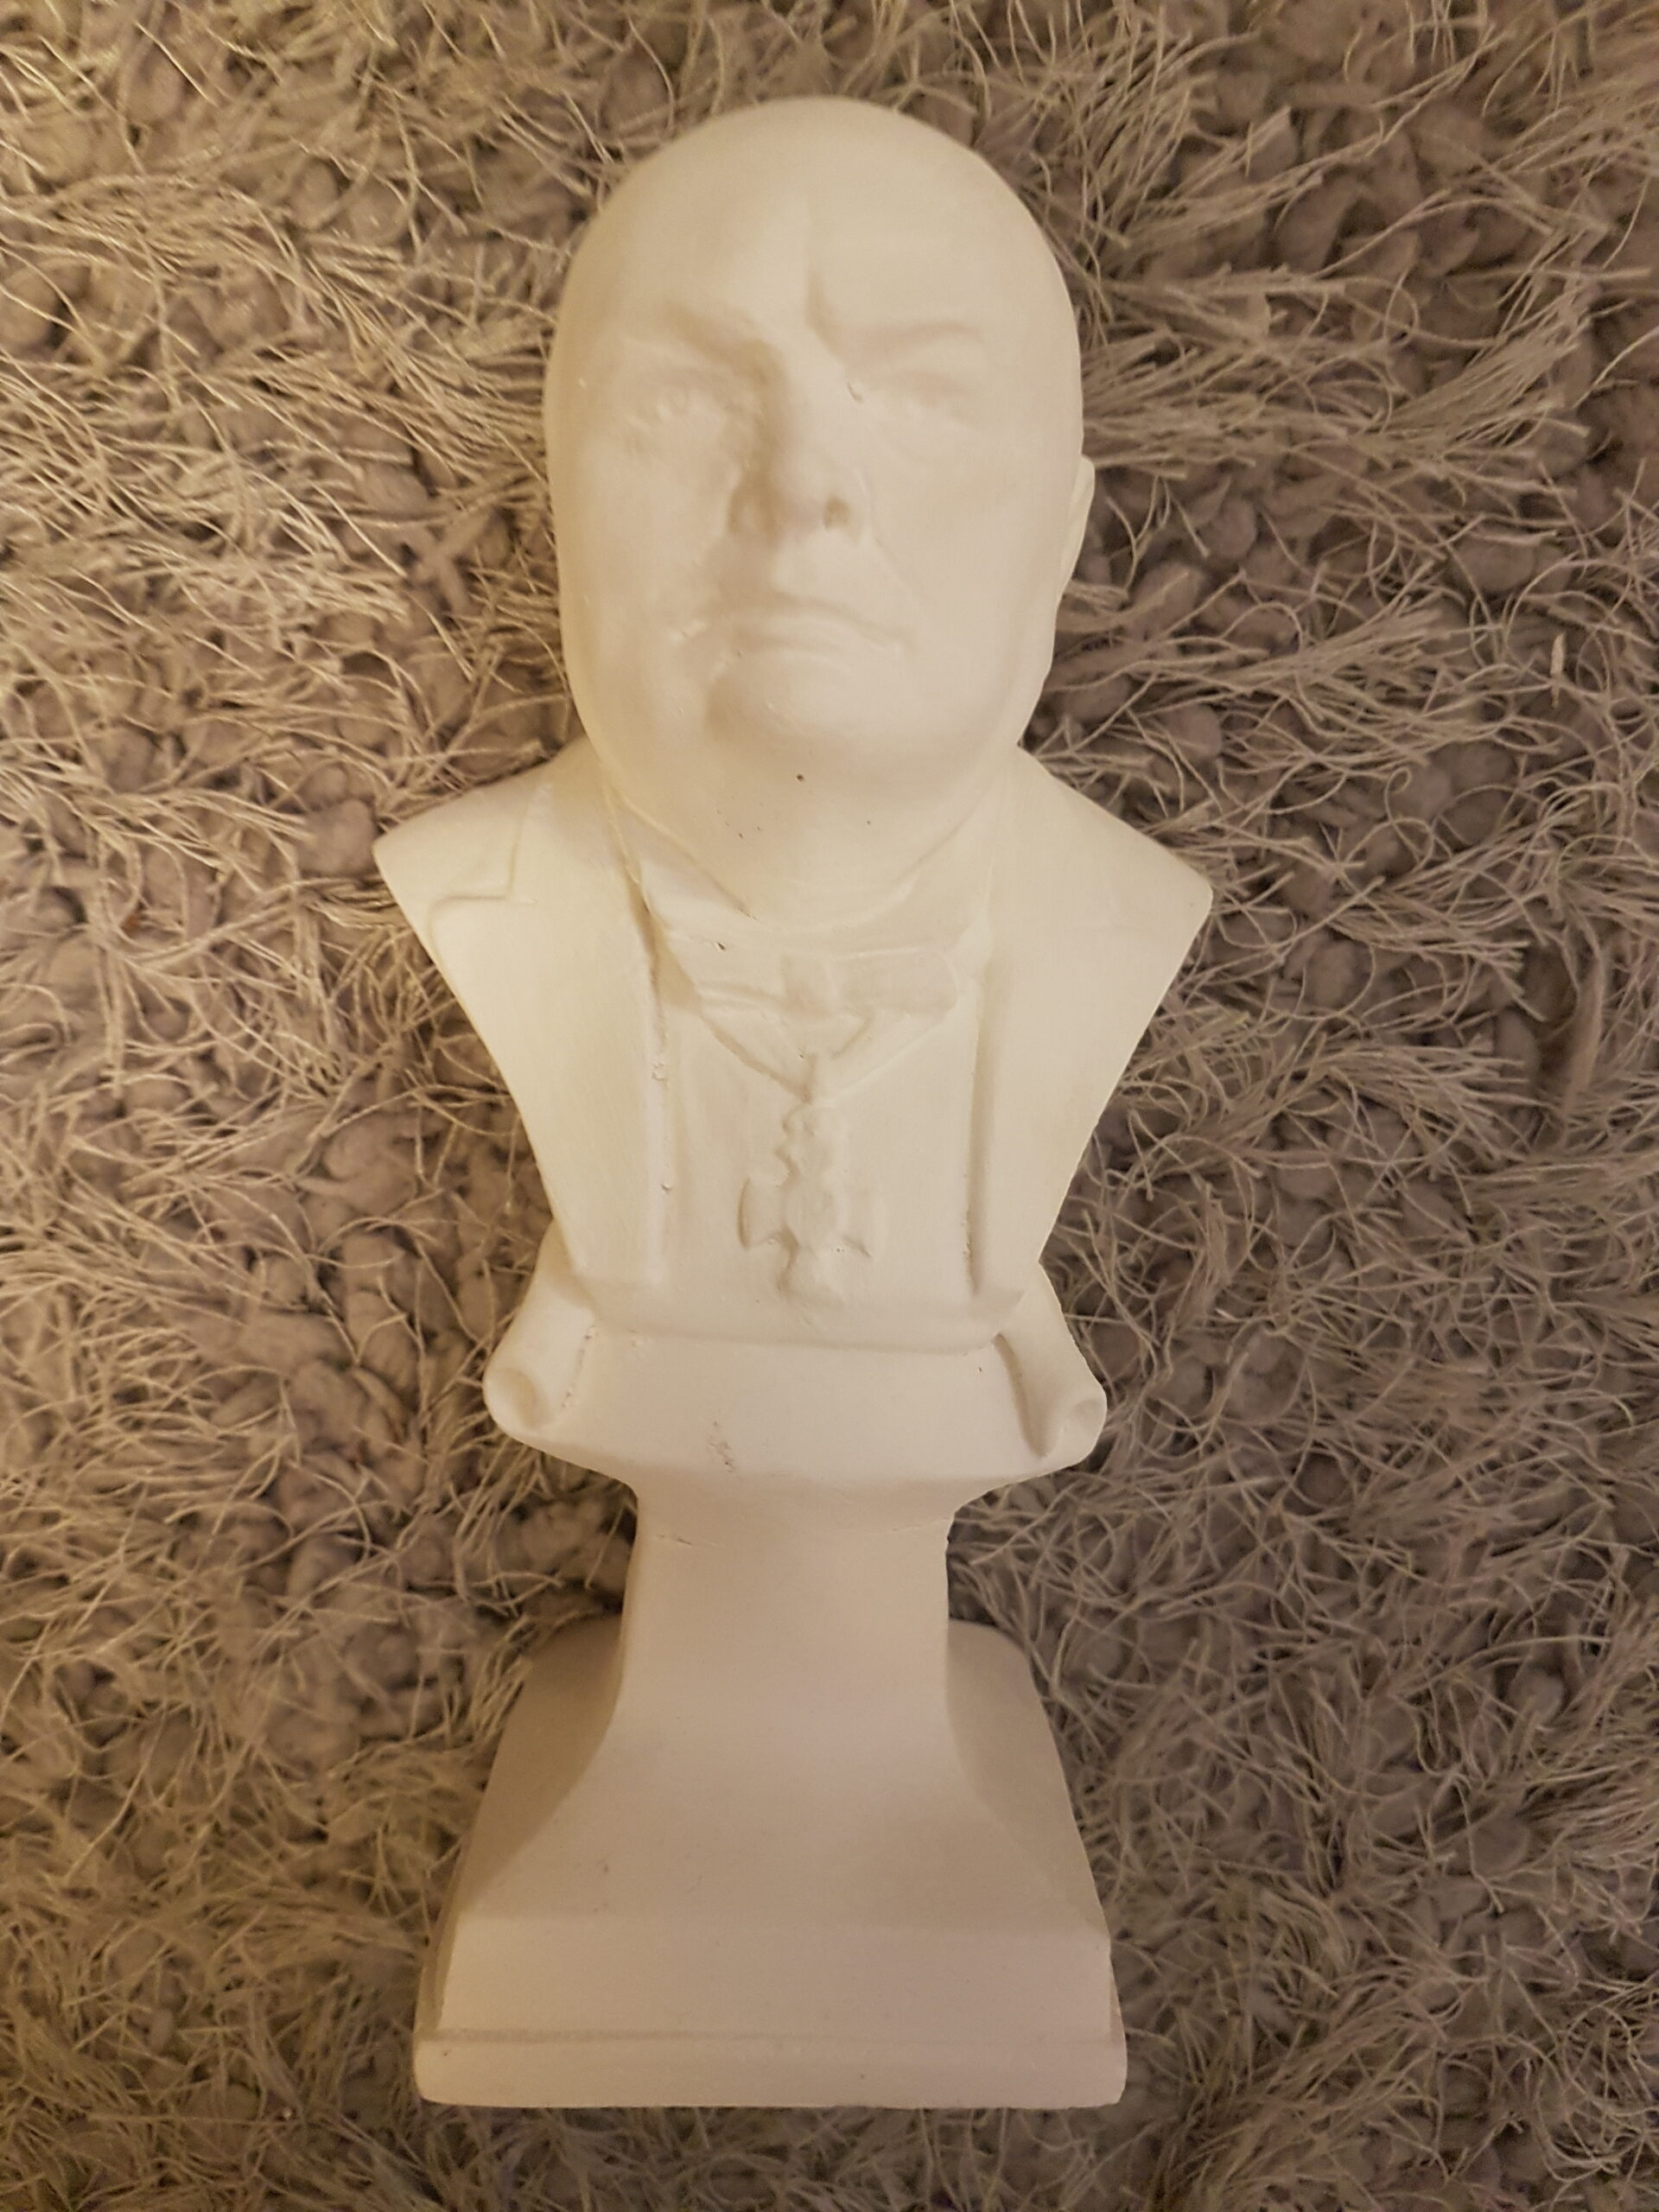 Sir Winston Churchill Ornament Figurine Statue British Prime Minister Moulding